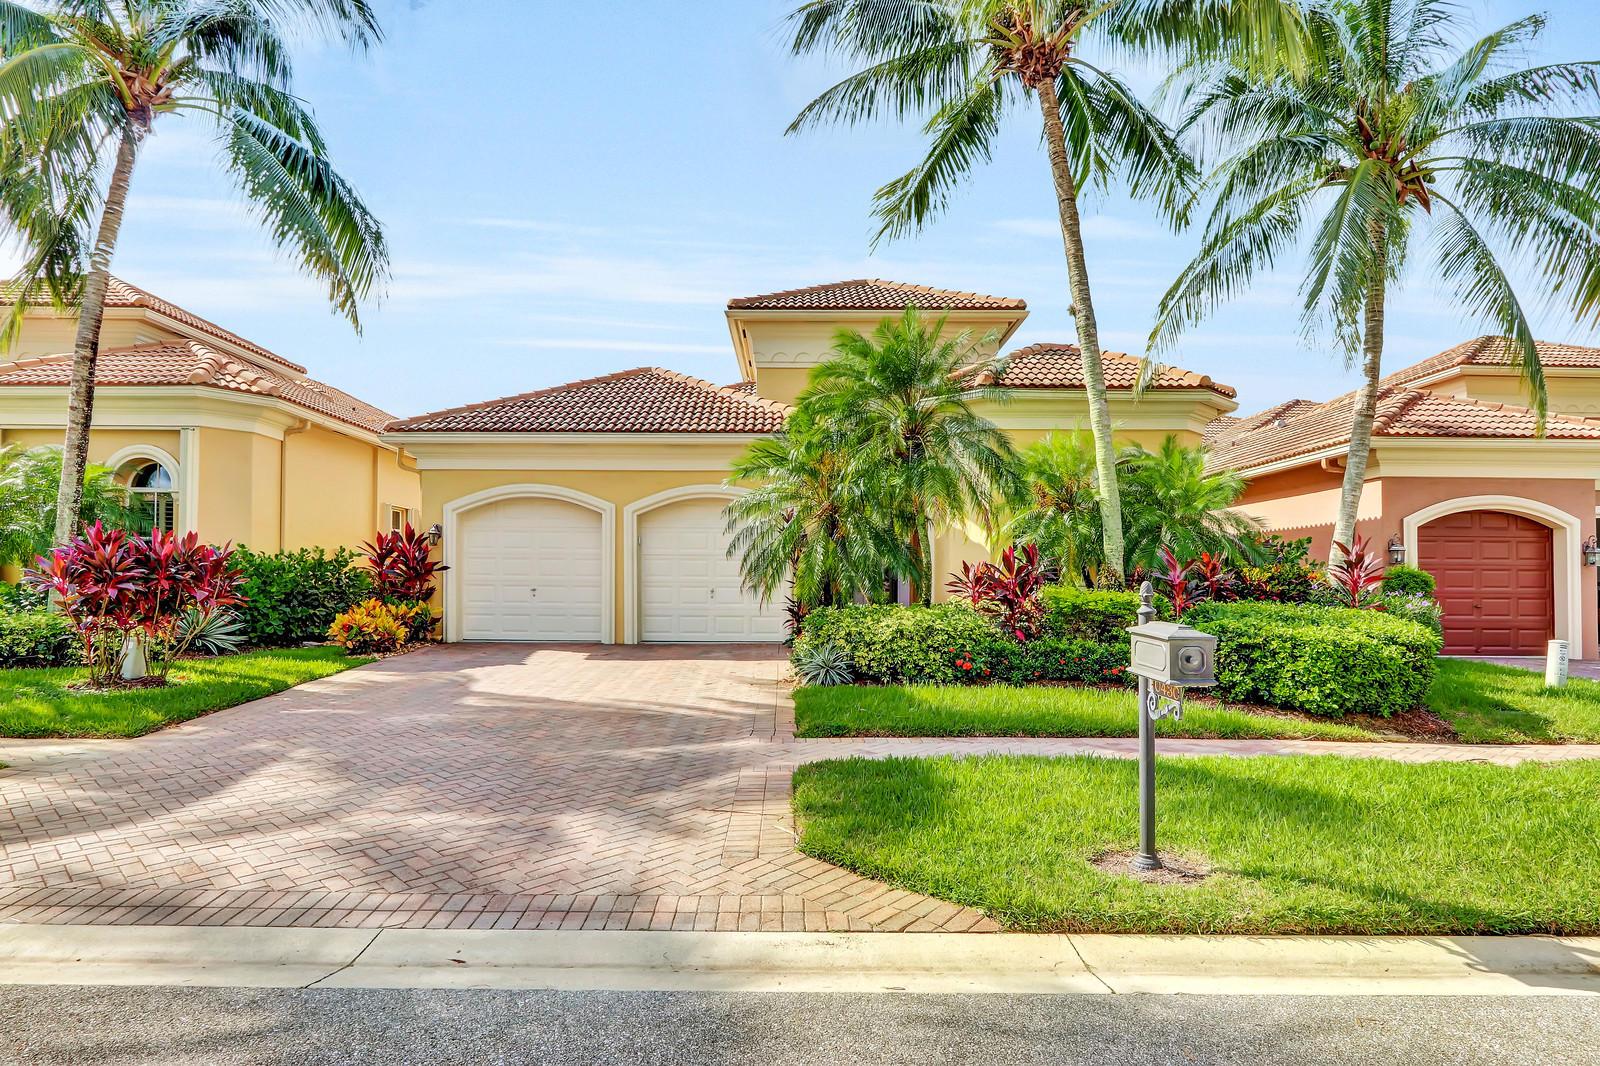 Photo of 10430 Terra Lago Drive, West Palm Beach, FL 33412